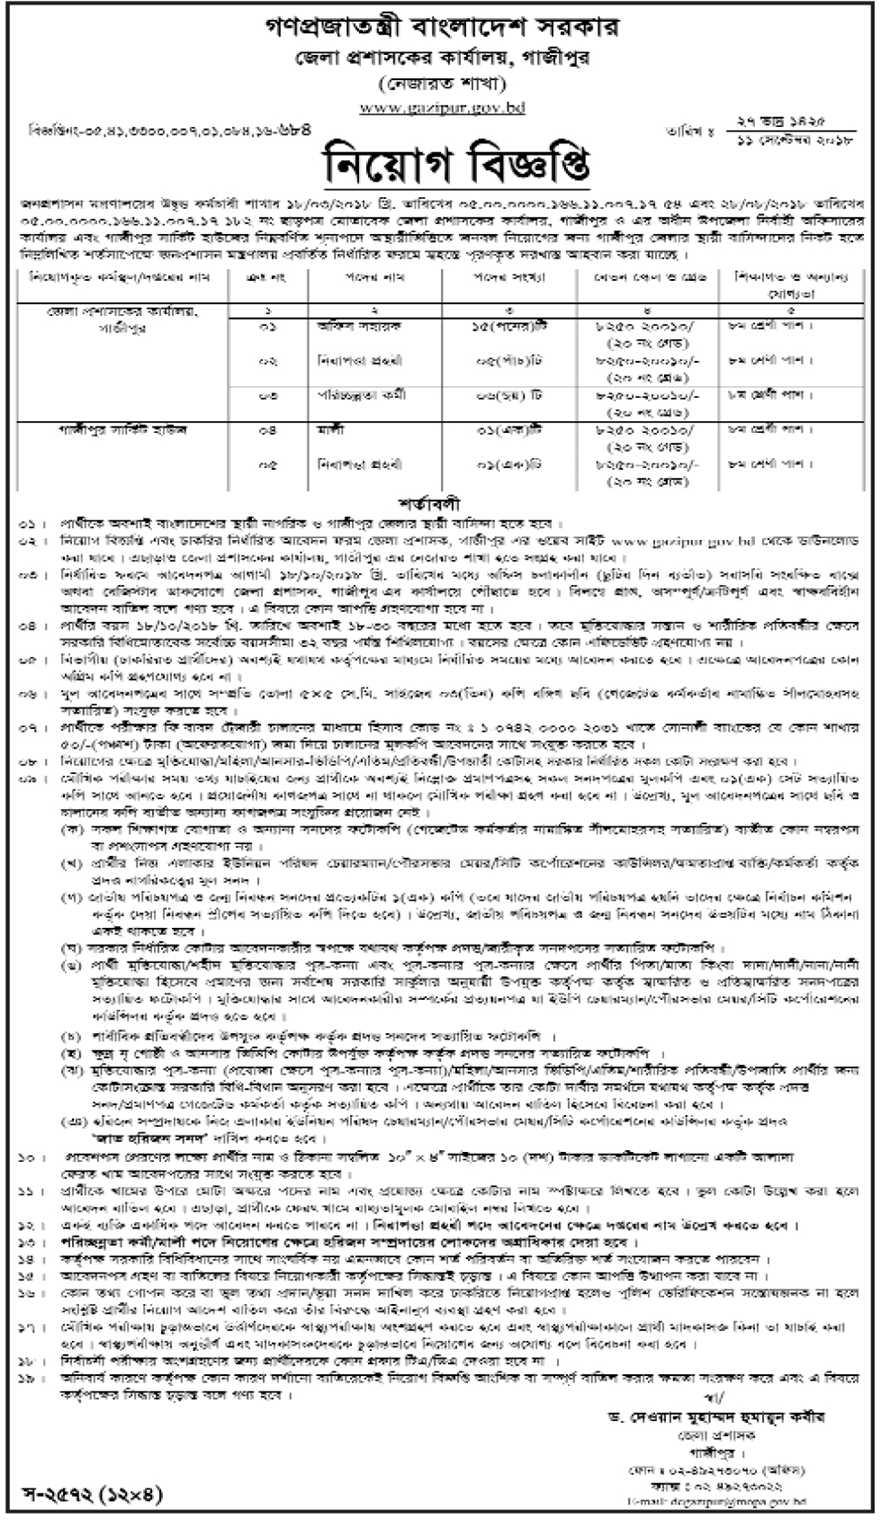 Gazipur District Job Circular 2018